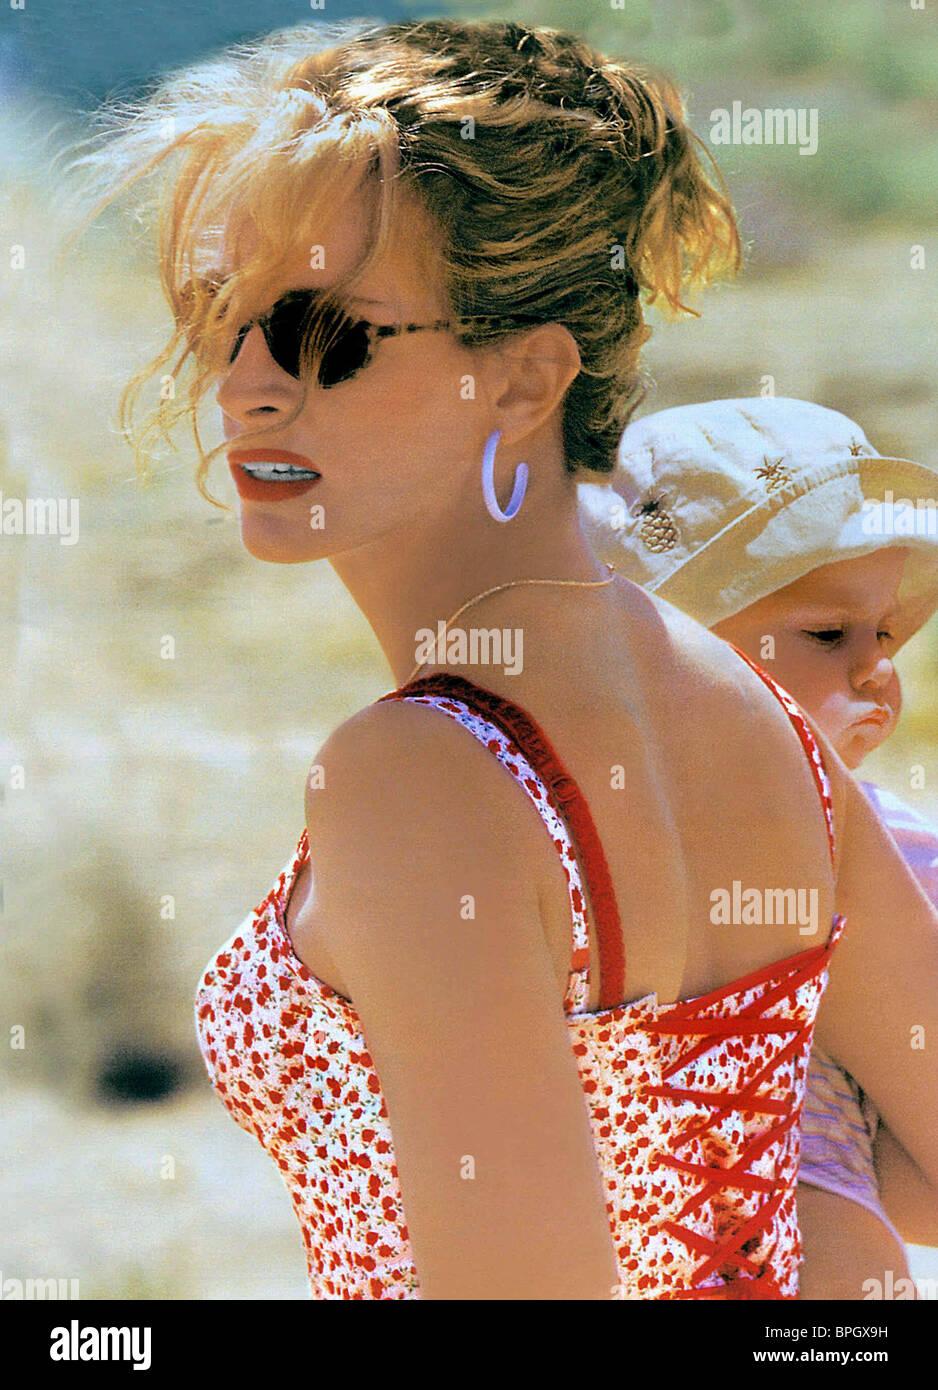 Julia Roberts Erin Brockovich 2000 Stock Photo Alamy